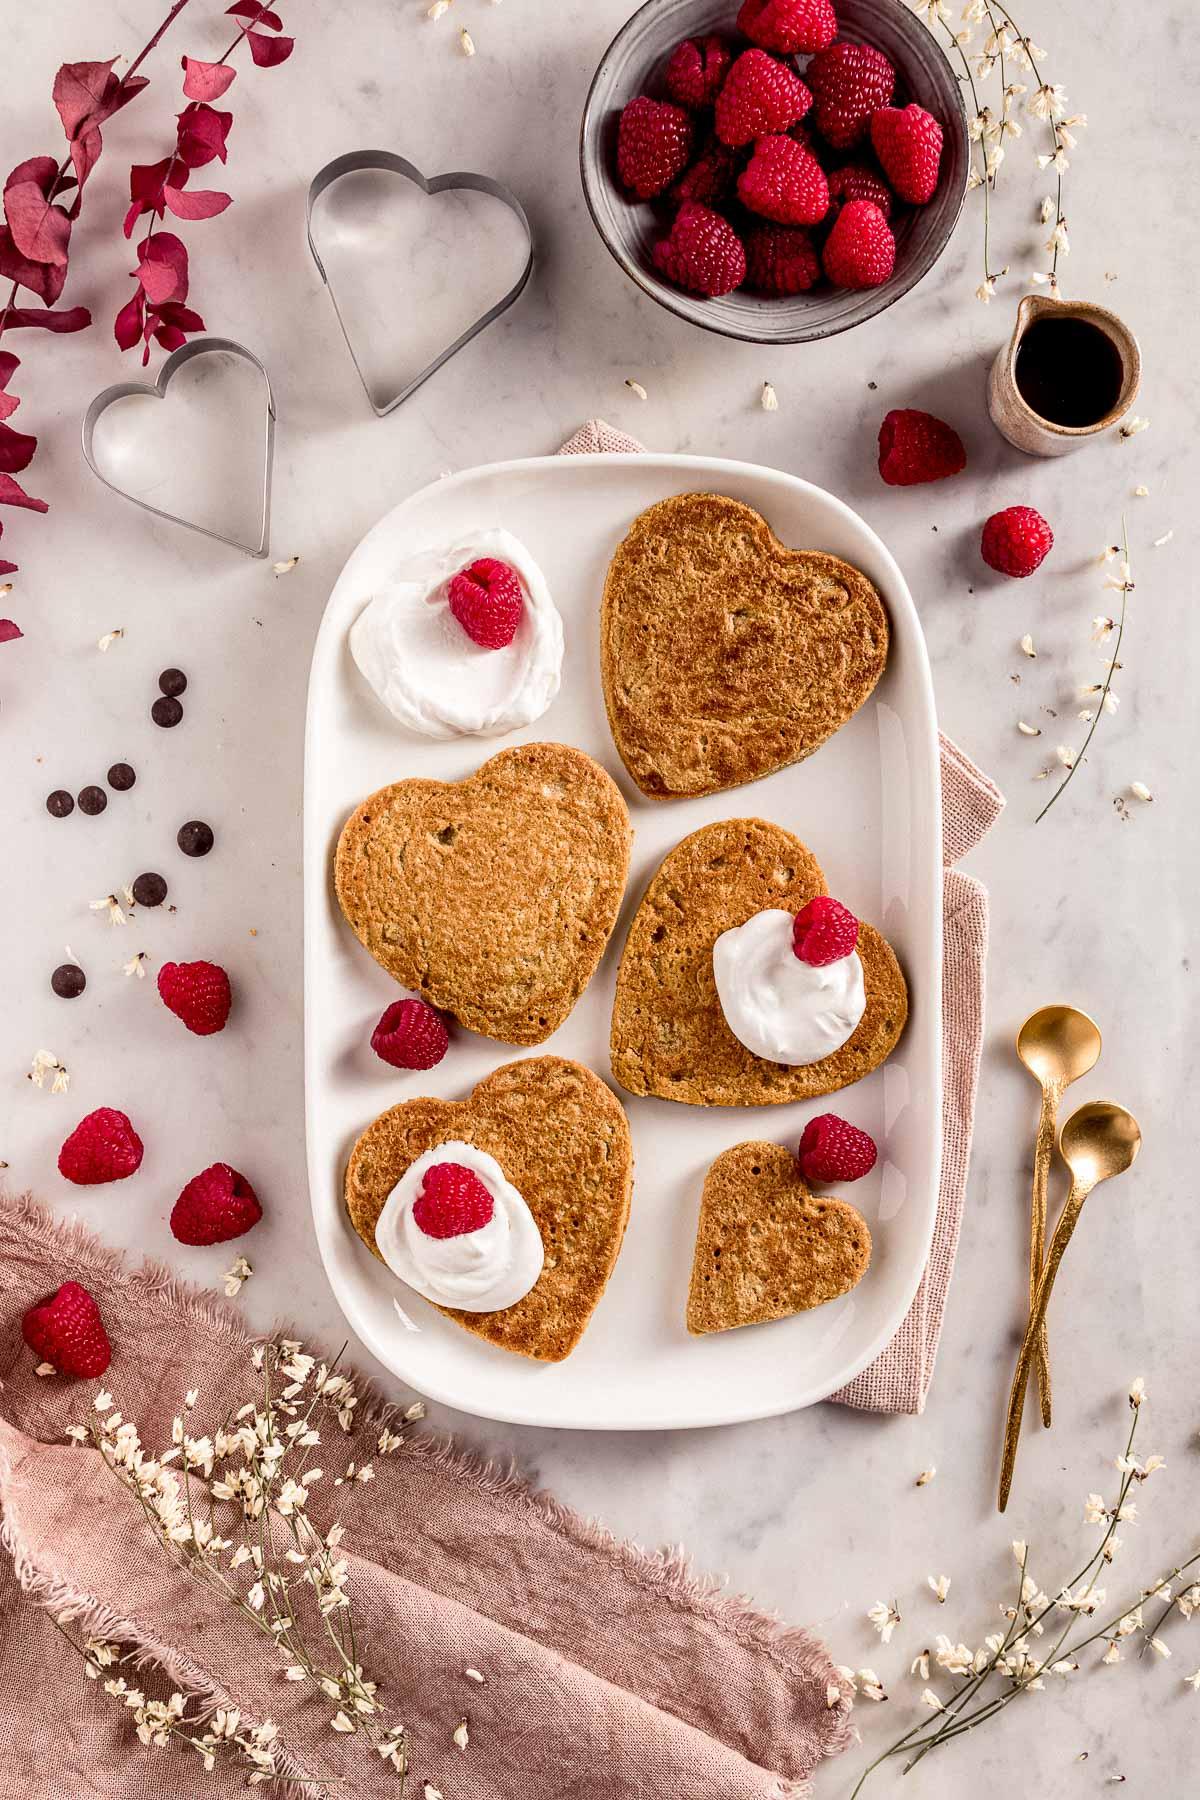 Easy blender gluten-free vegan oat pancakes valentine's day pancakes nut-free recipe ricetta Pancakes di san Valentino vegan senza glutine all'avena e cioccolato facili light senza frutta secca